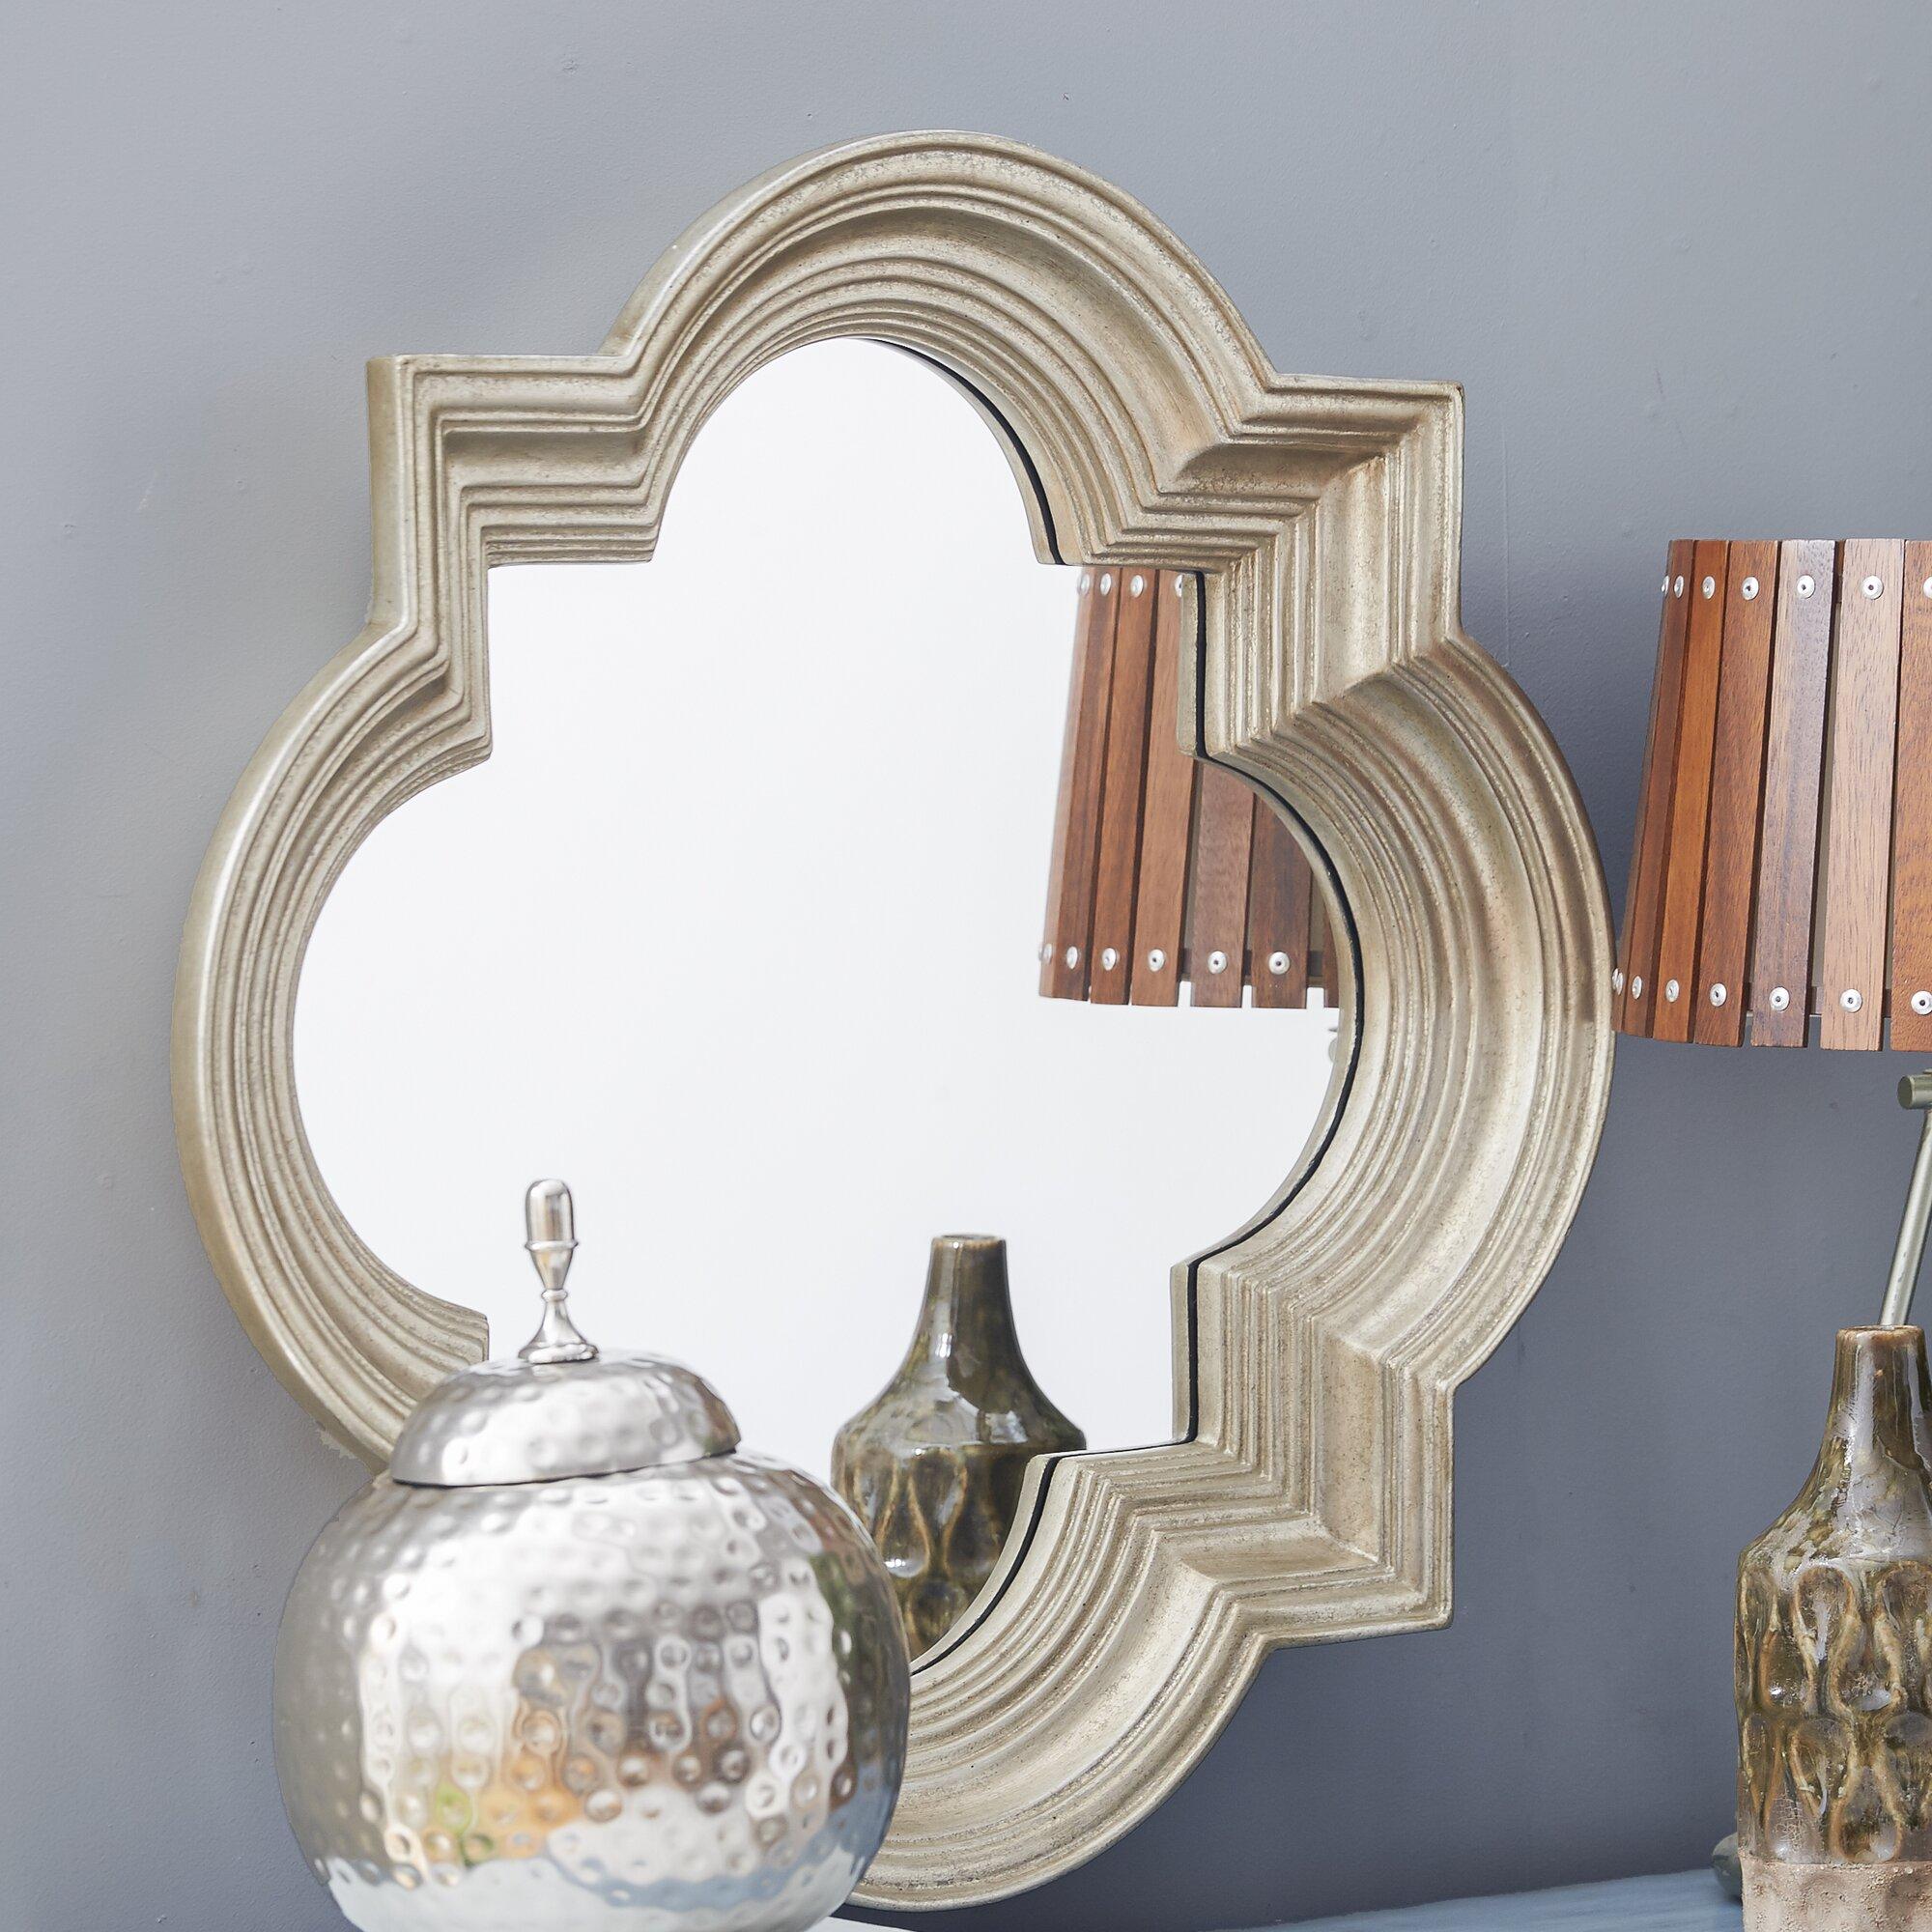 platinum gold decorative wall mirror - Decorative Wall Mirror